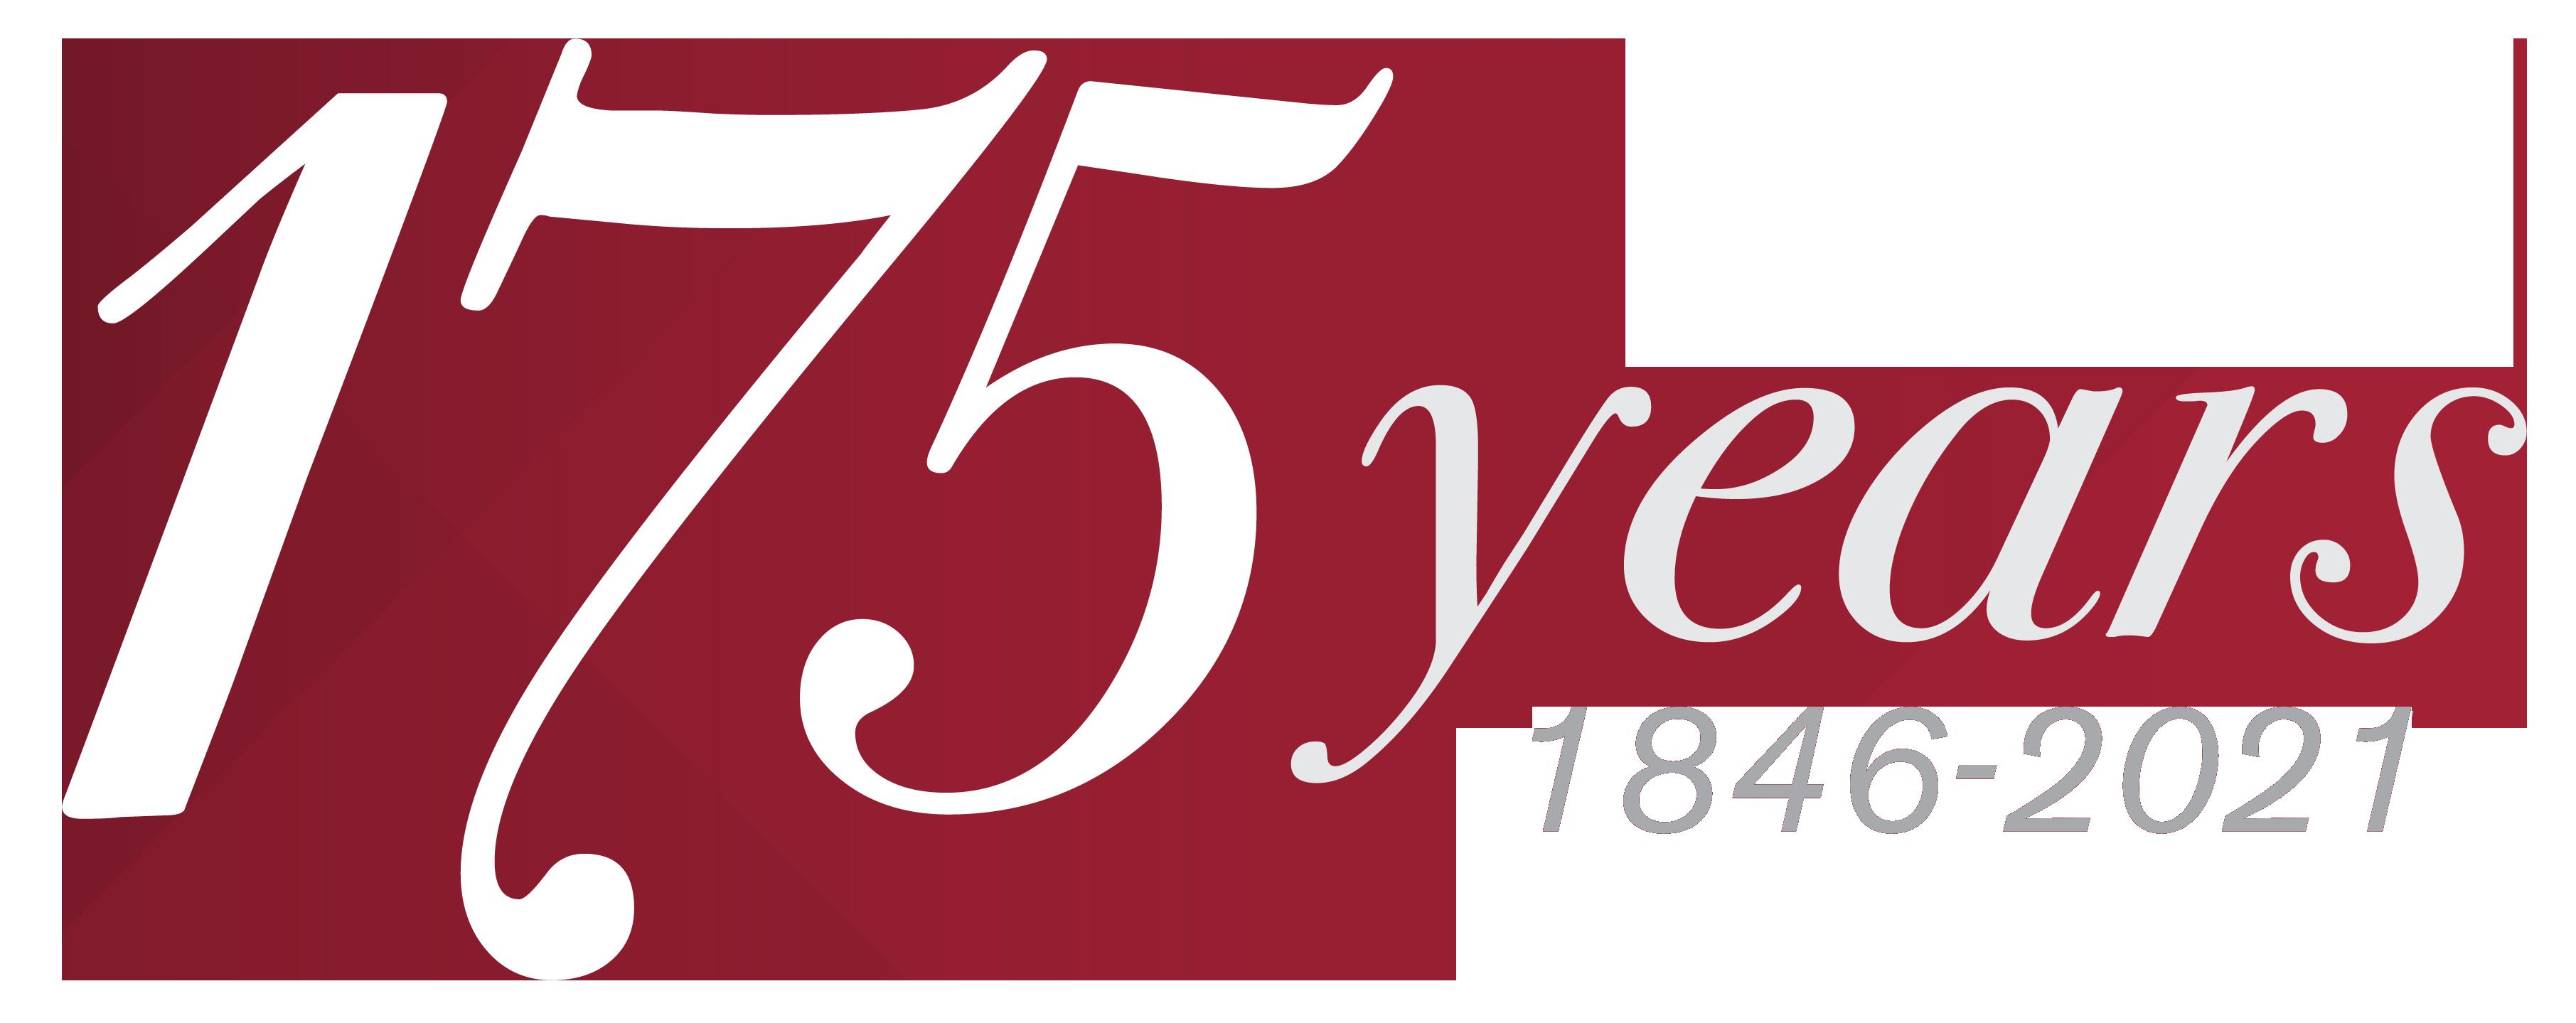 175 Years - 1846-2021